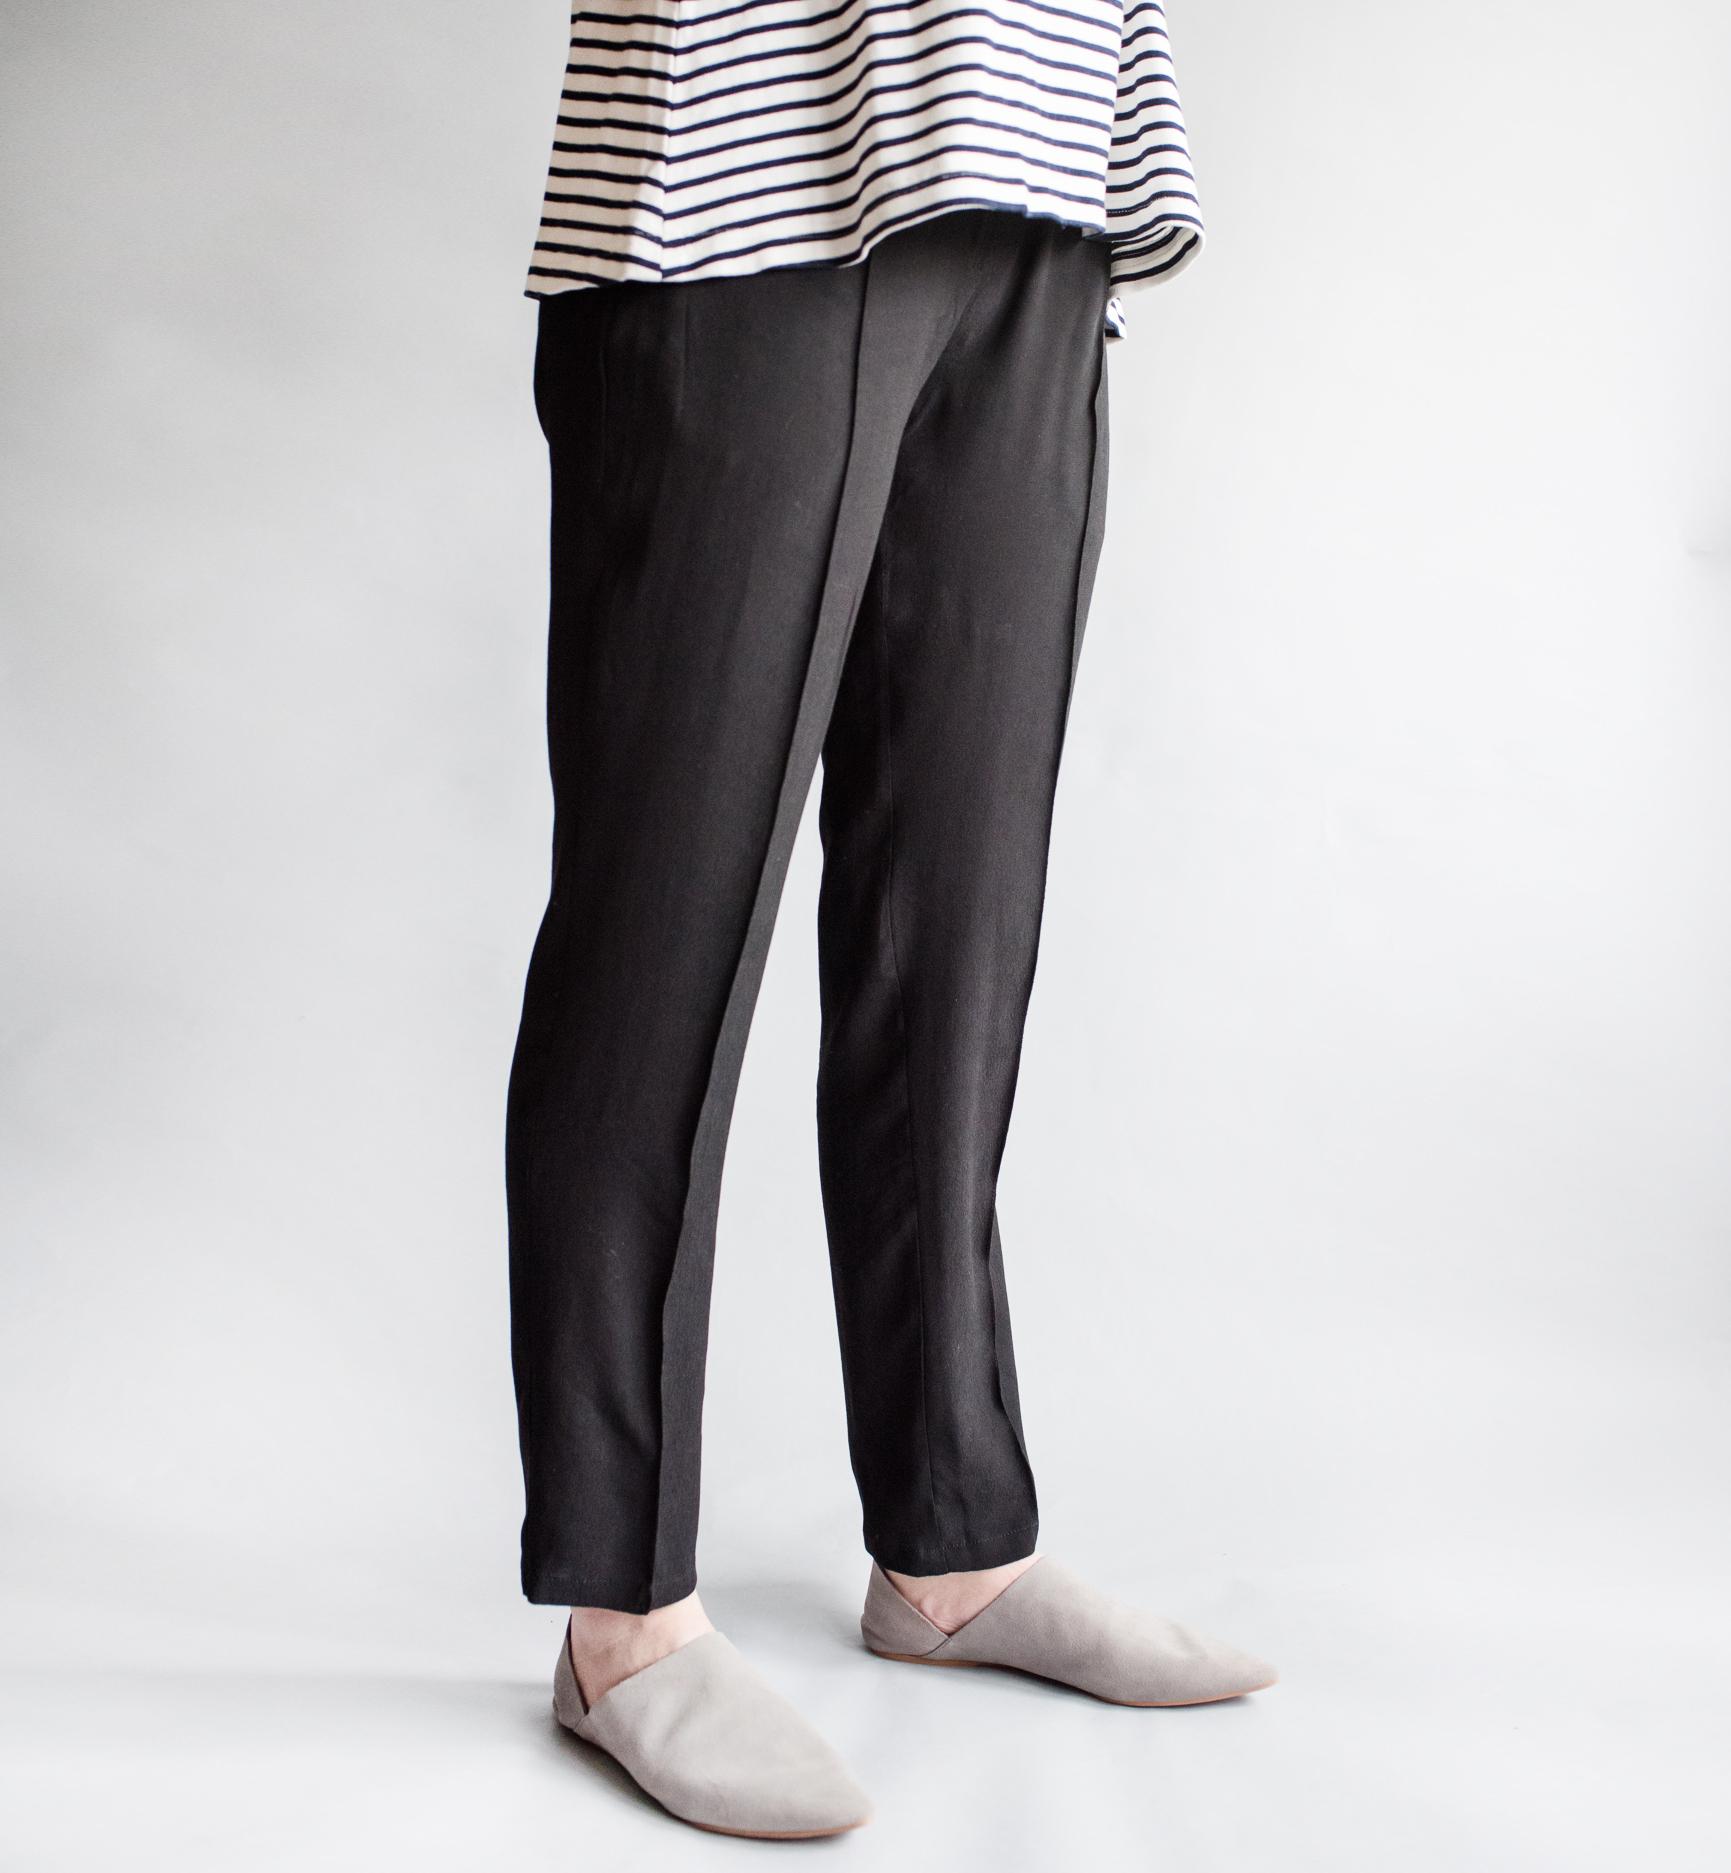 robinson-pdf-sewing-trouser21.jpg